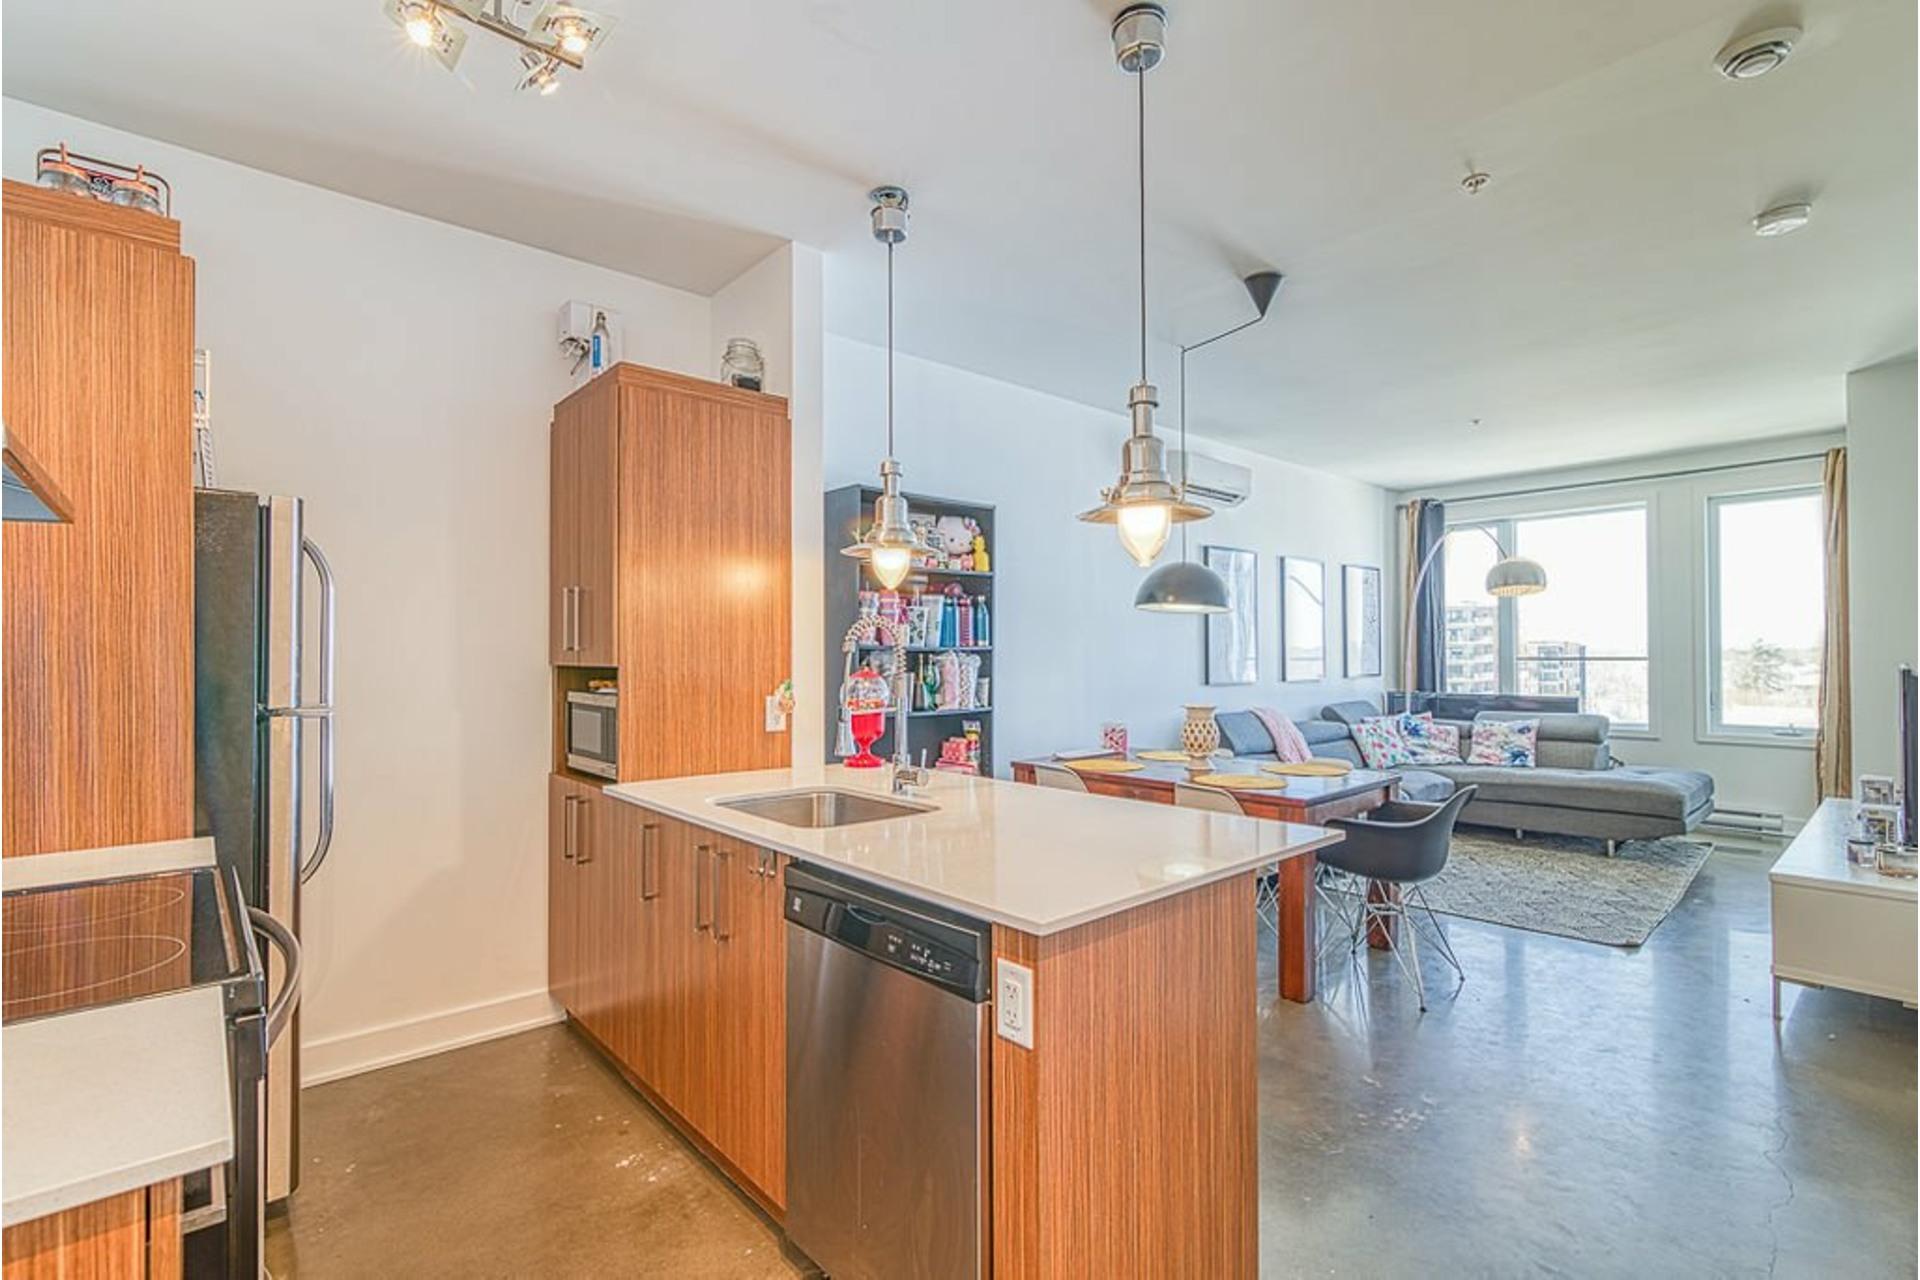 image 3 - Apartment For sale Blainville - 4 rooms